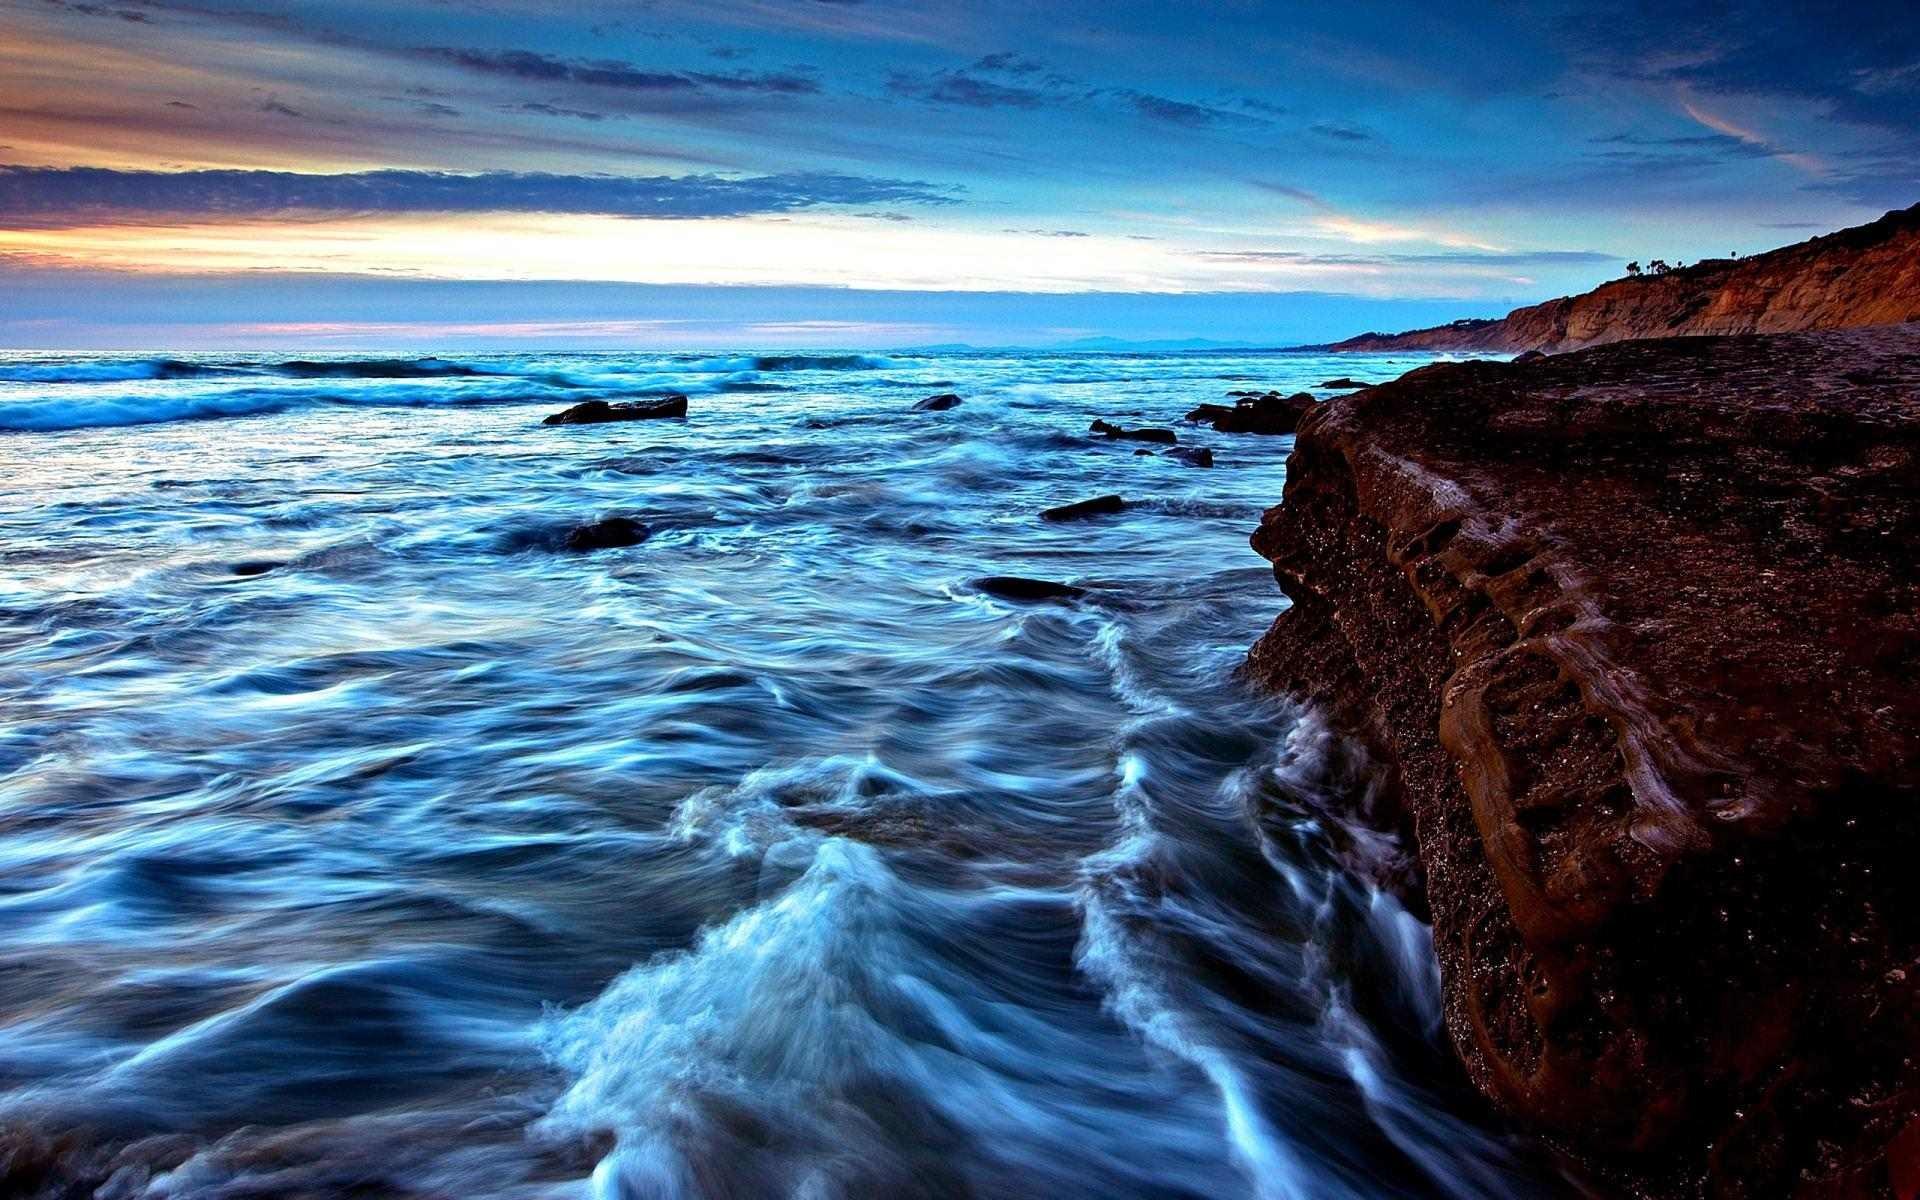 … ocean wallpaper and sea wallpaper hd hd wallpapers high definition …